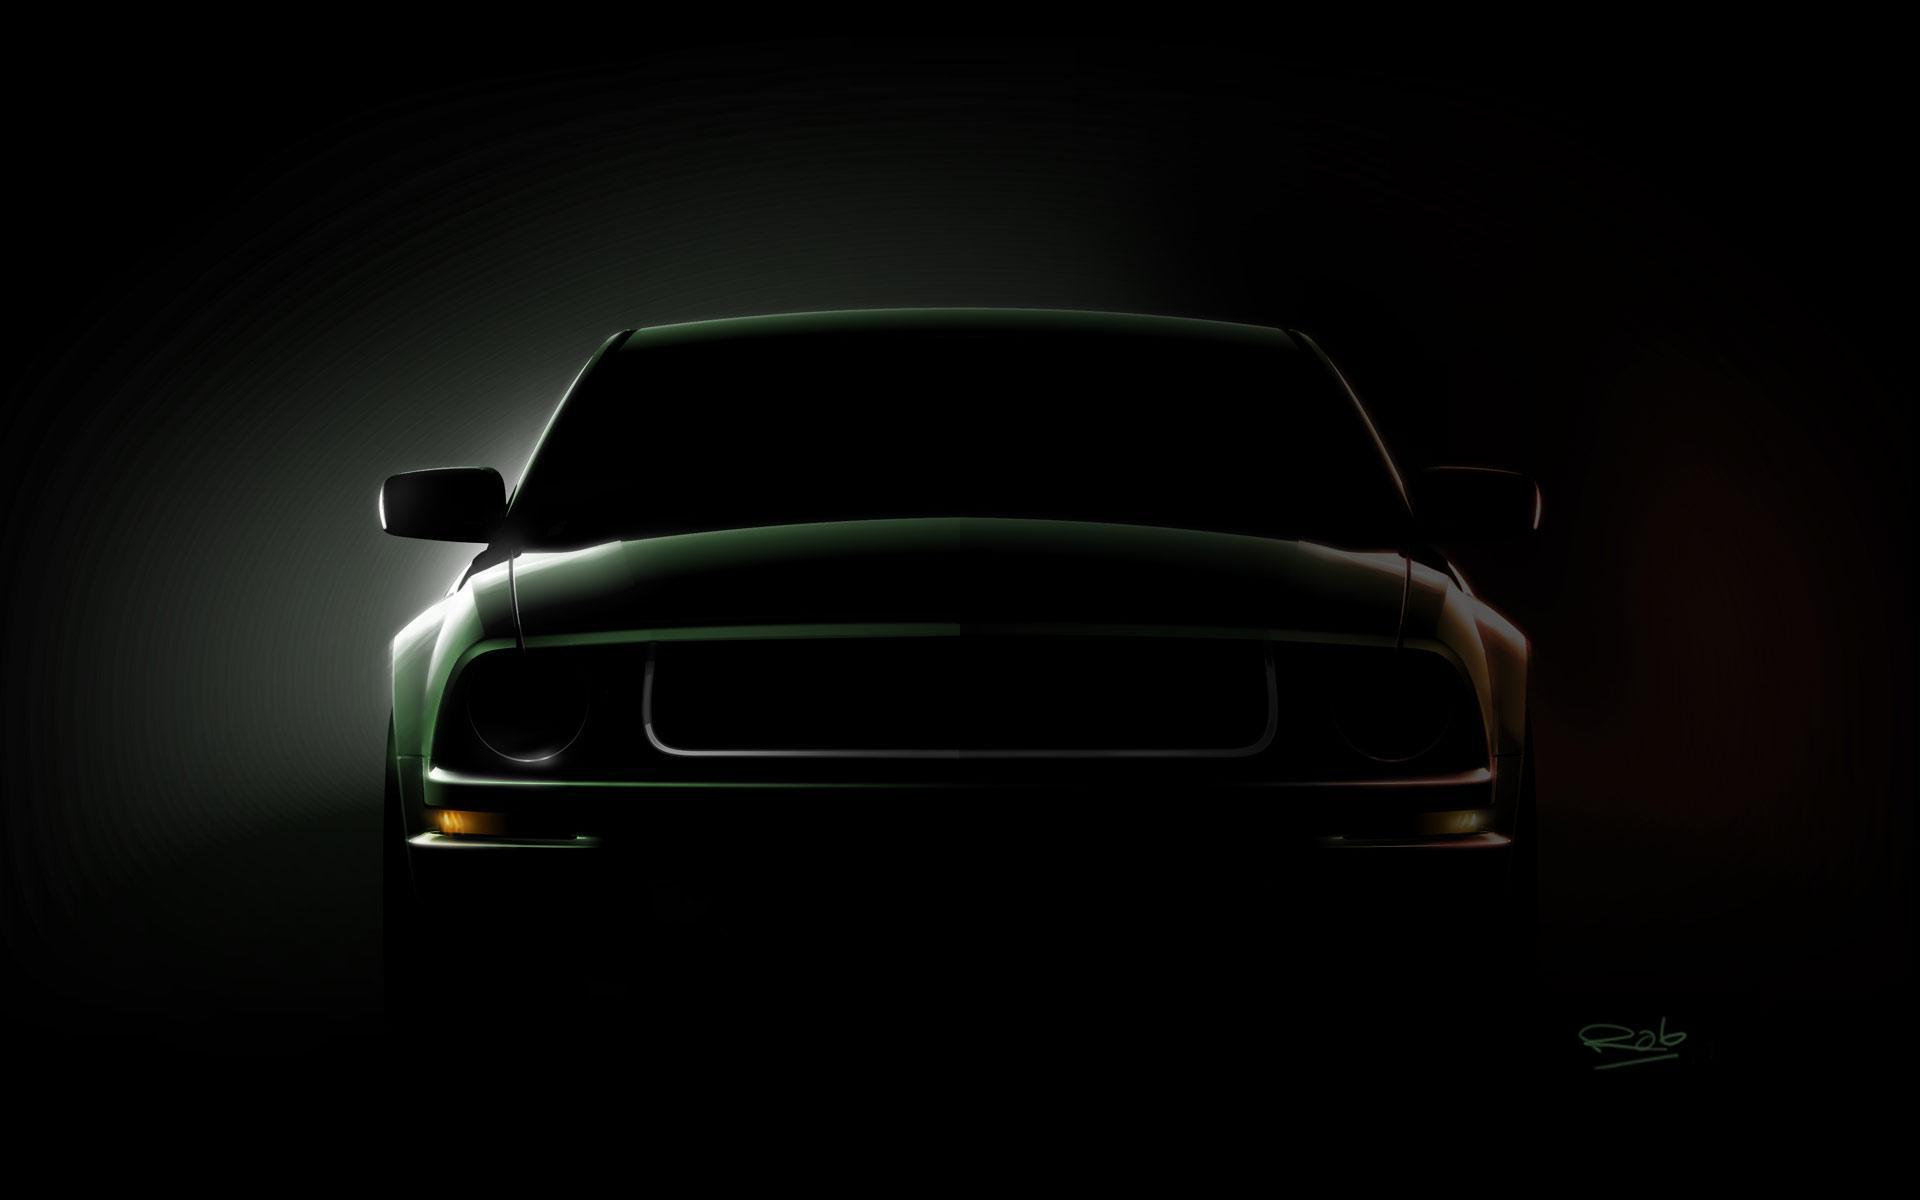 Mustang logo wallpaper black - photo#1